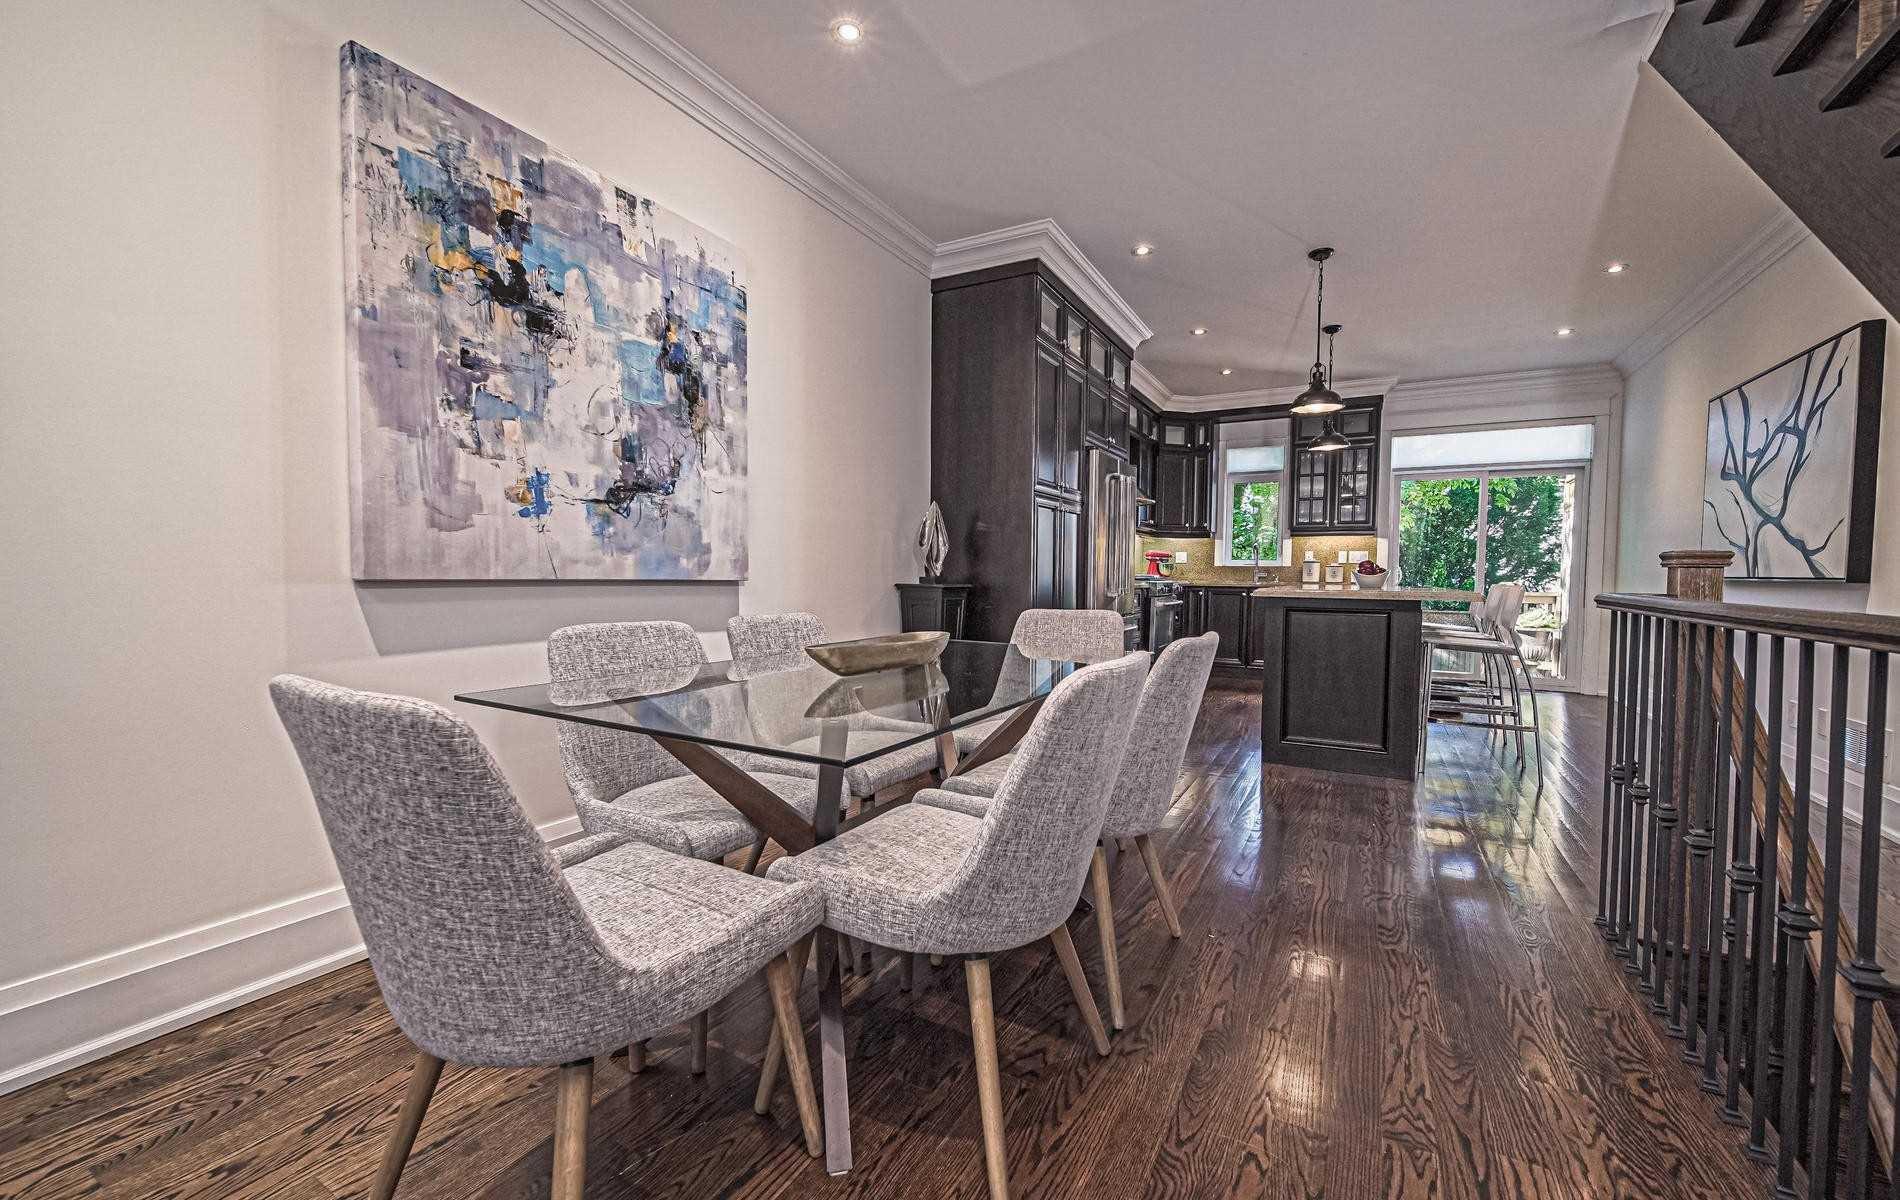 Photo 3: Photos: 216A Hamilton Street in Toronto: South Riverdale House (3-Storey) for sale (Toronto E01)  : MLS®# E4619870